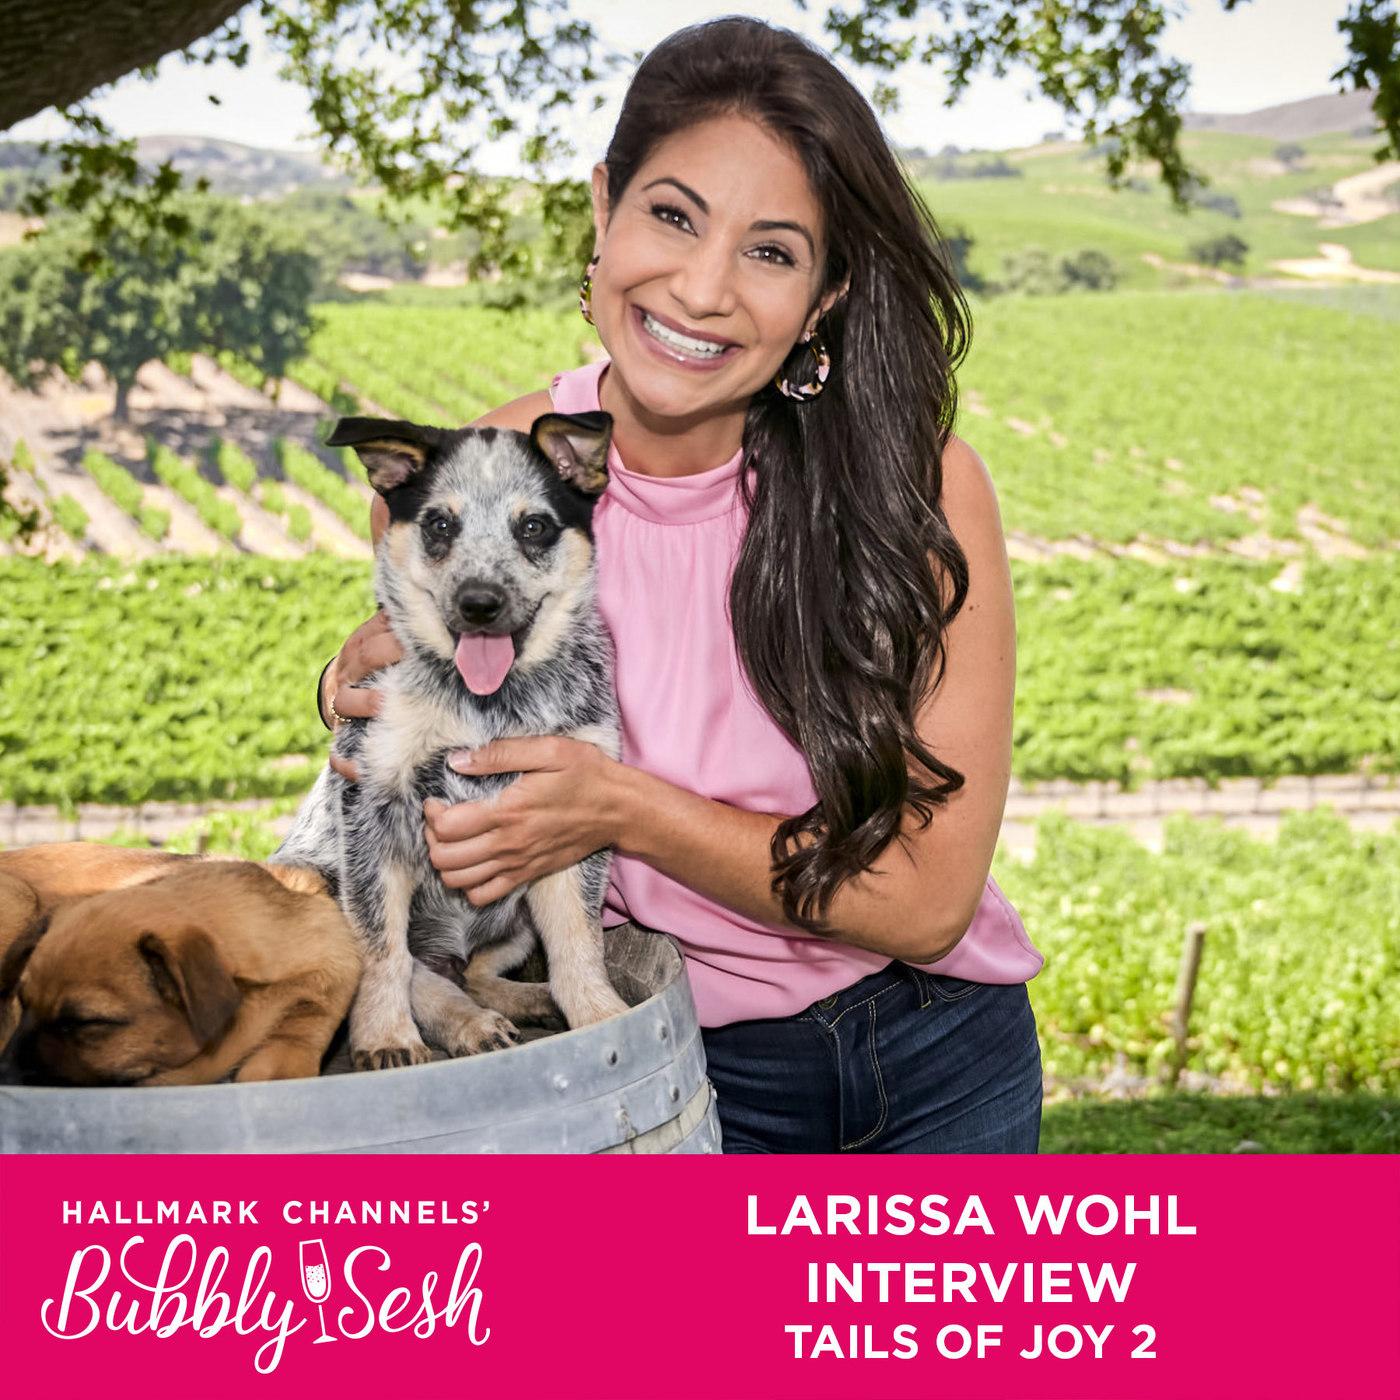 Larissa Wohl, Tails of Joy 2 Interview